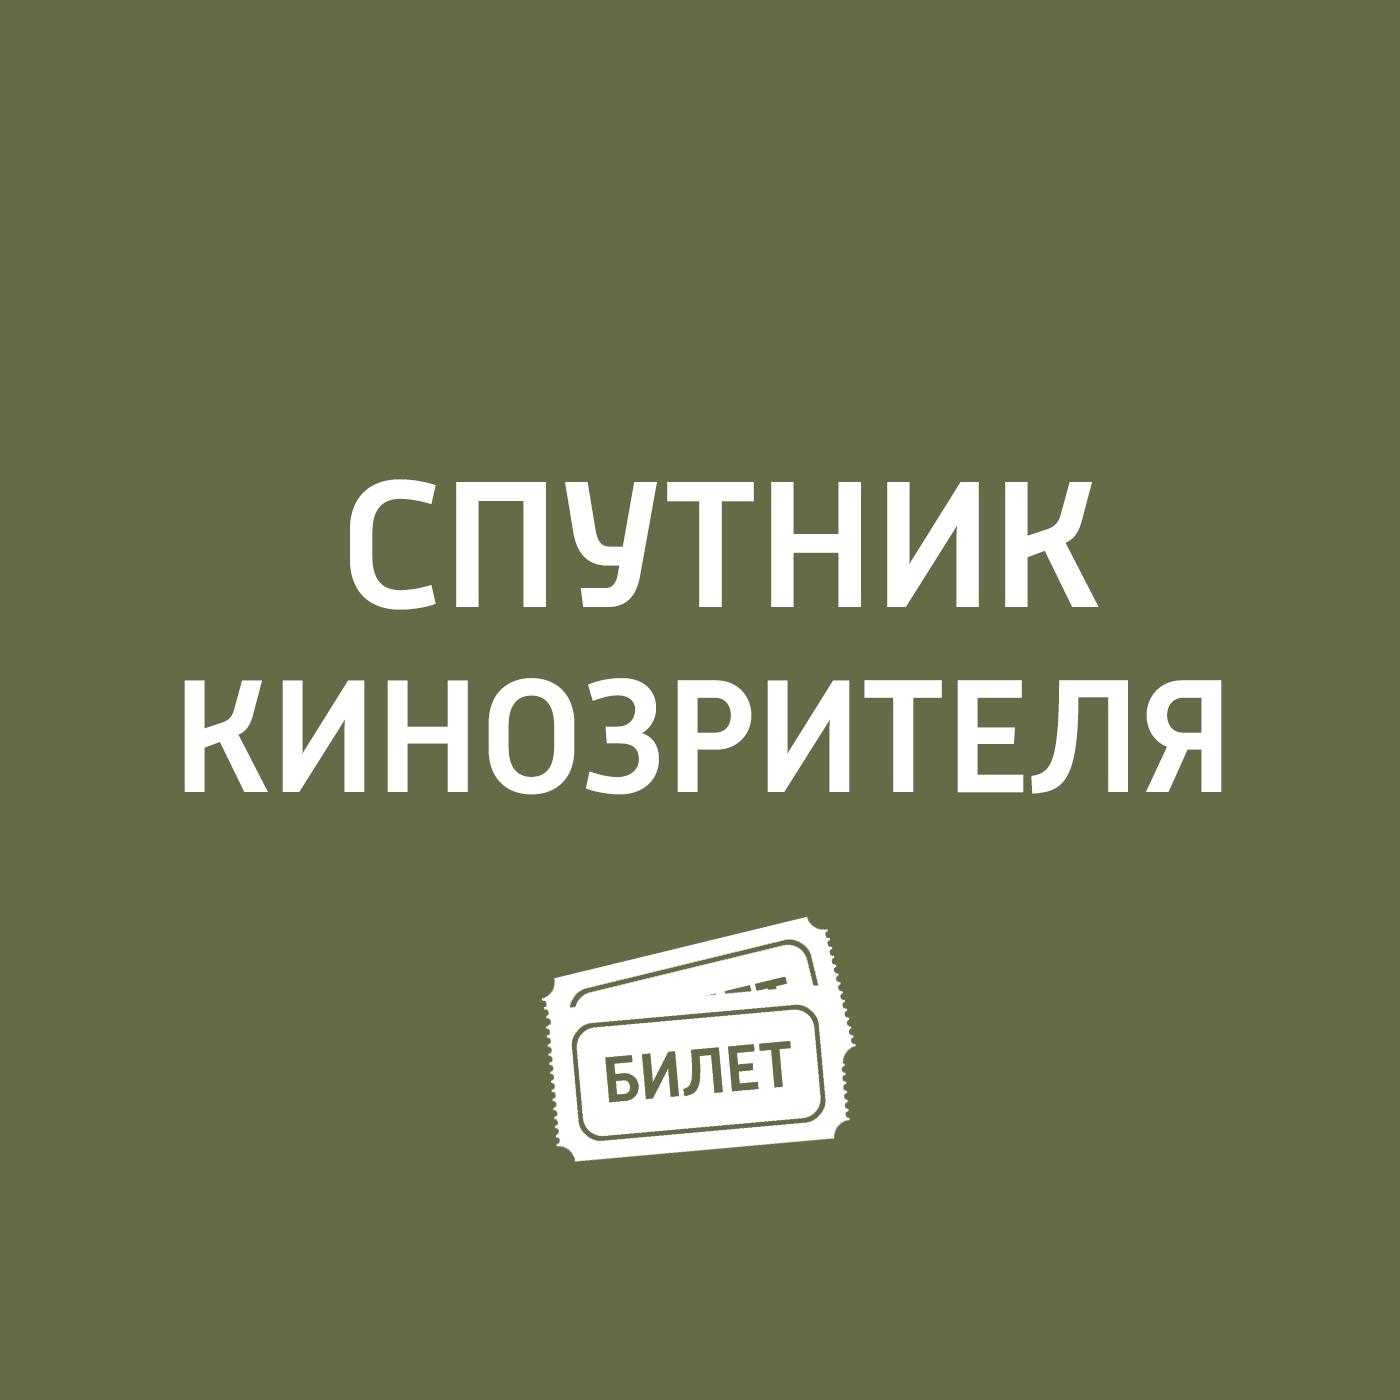 Антон Долин «Излом времени»; «Пассажир»; «Ну, здравствуй, Оксана Соколова!»; «Ева»... елена соколова здравствуй человек